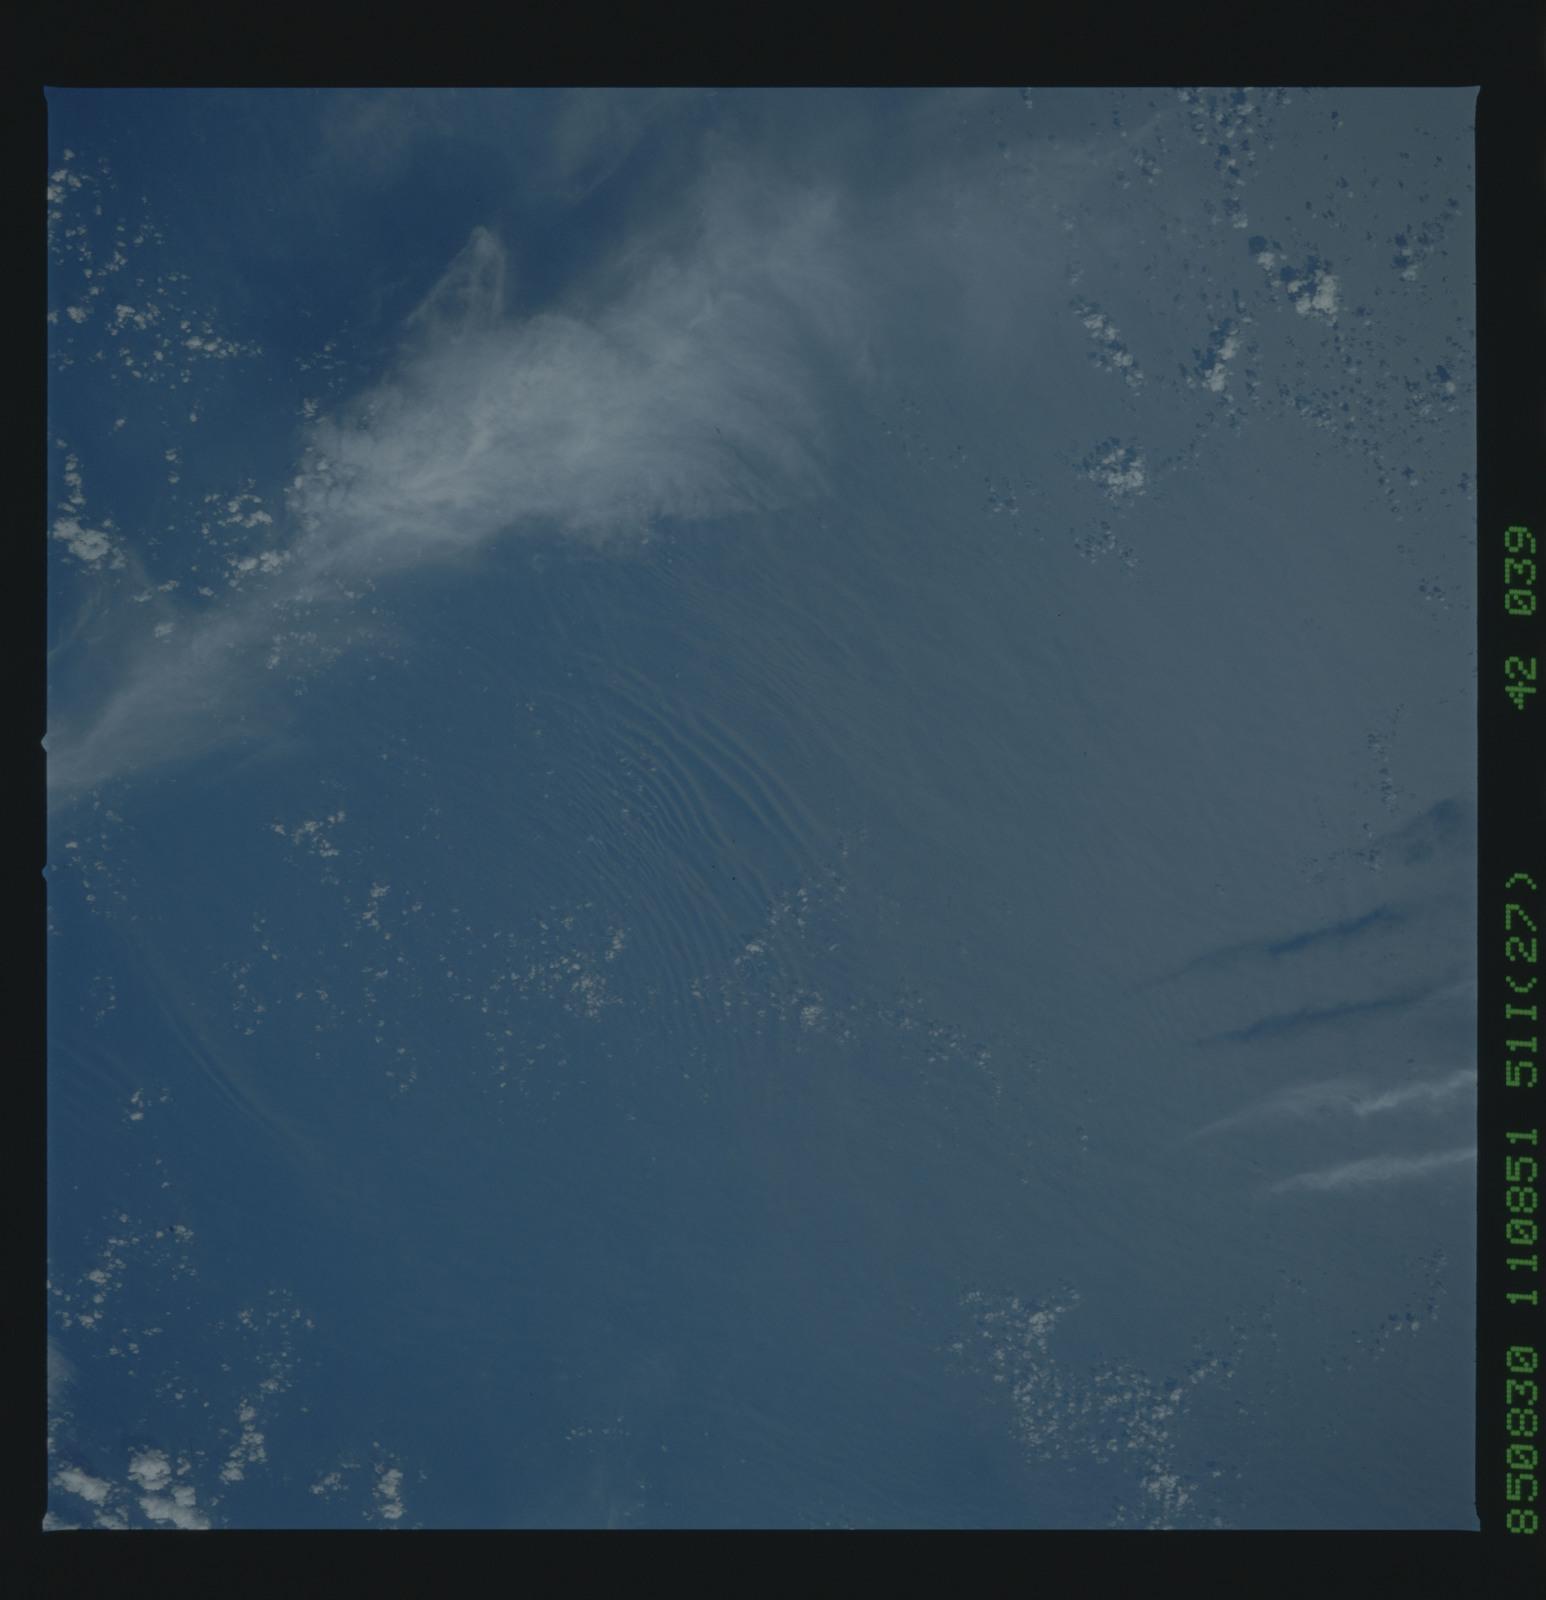 51I-42-039 - STS-51I - STS-51I earth observations